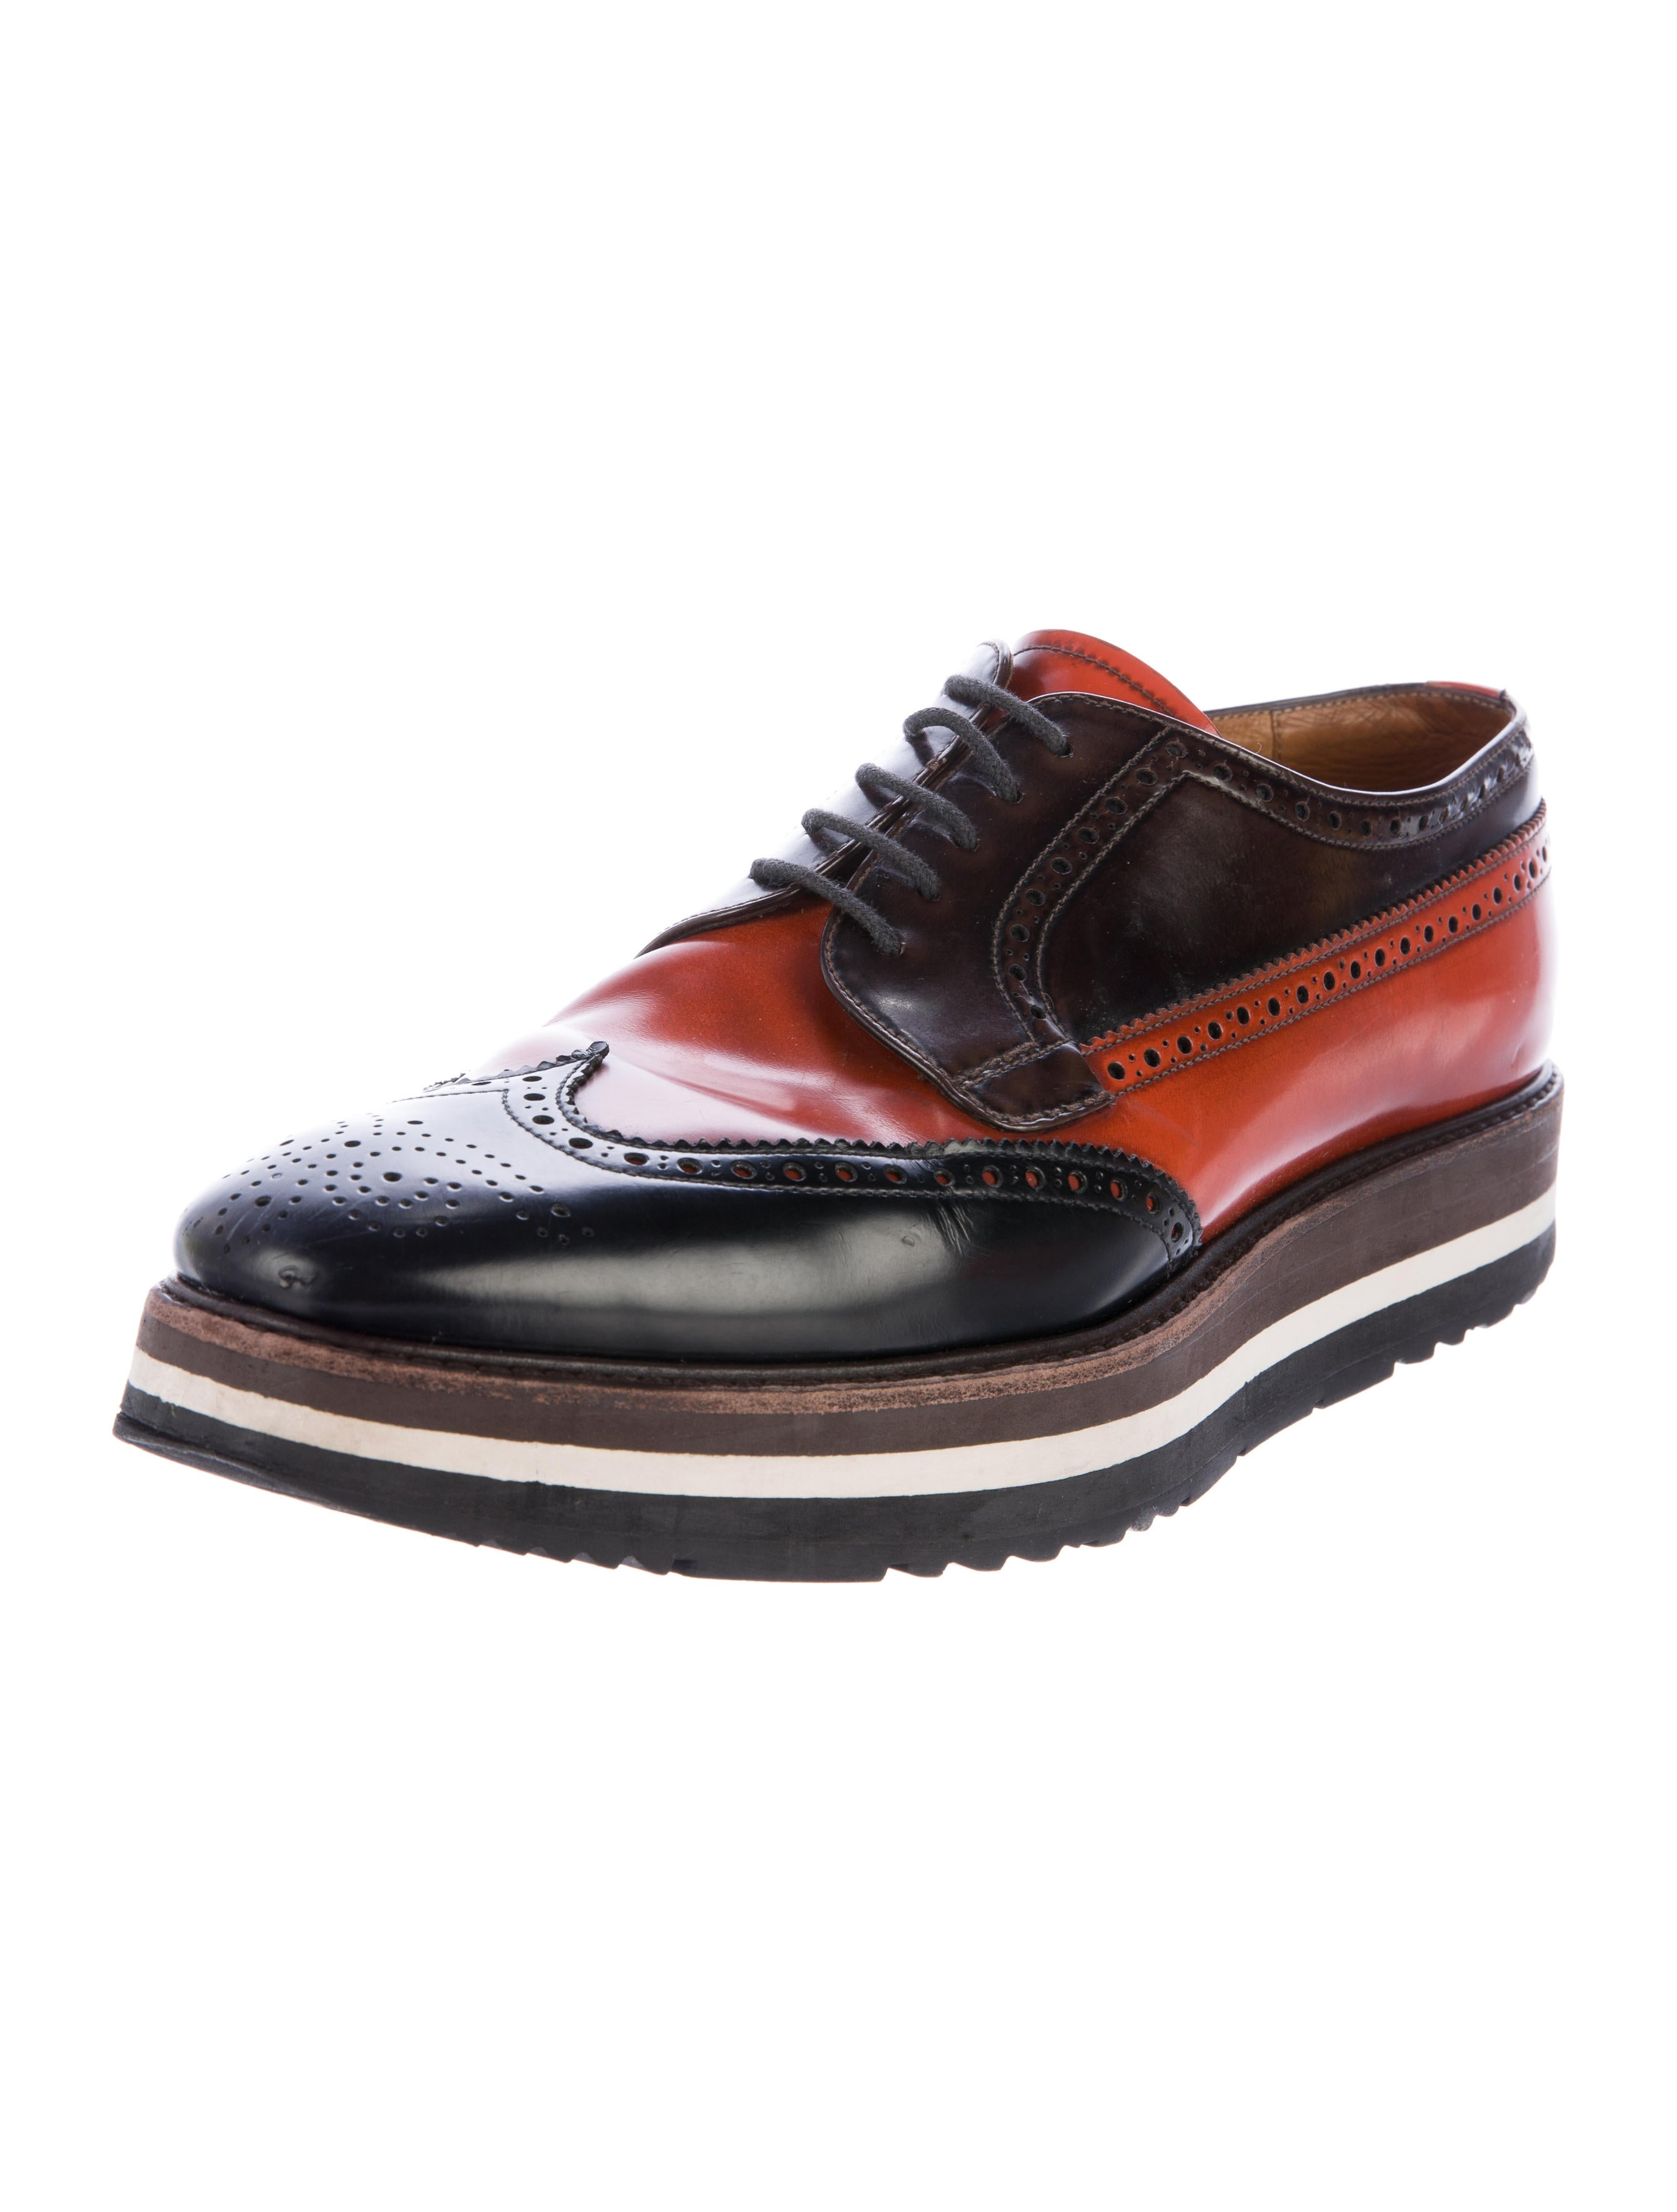 prada leather platform brogues mens shoes pra151186